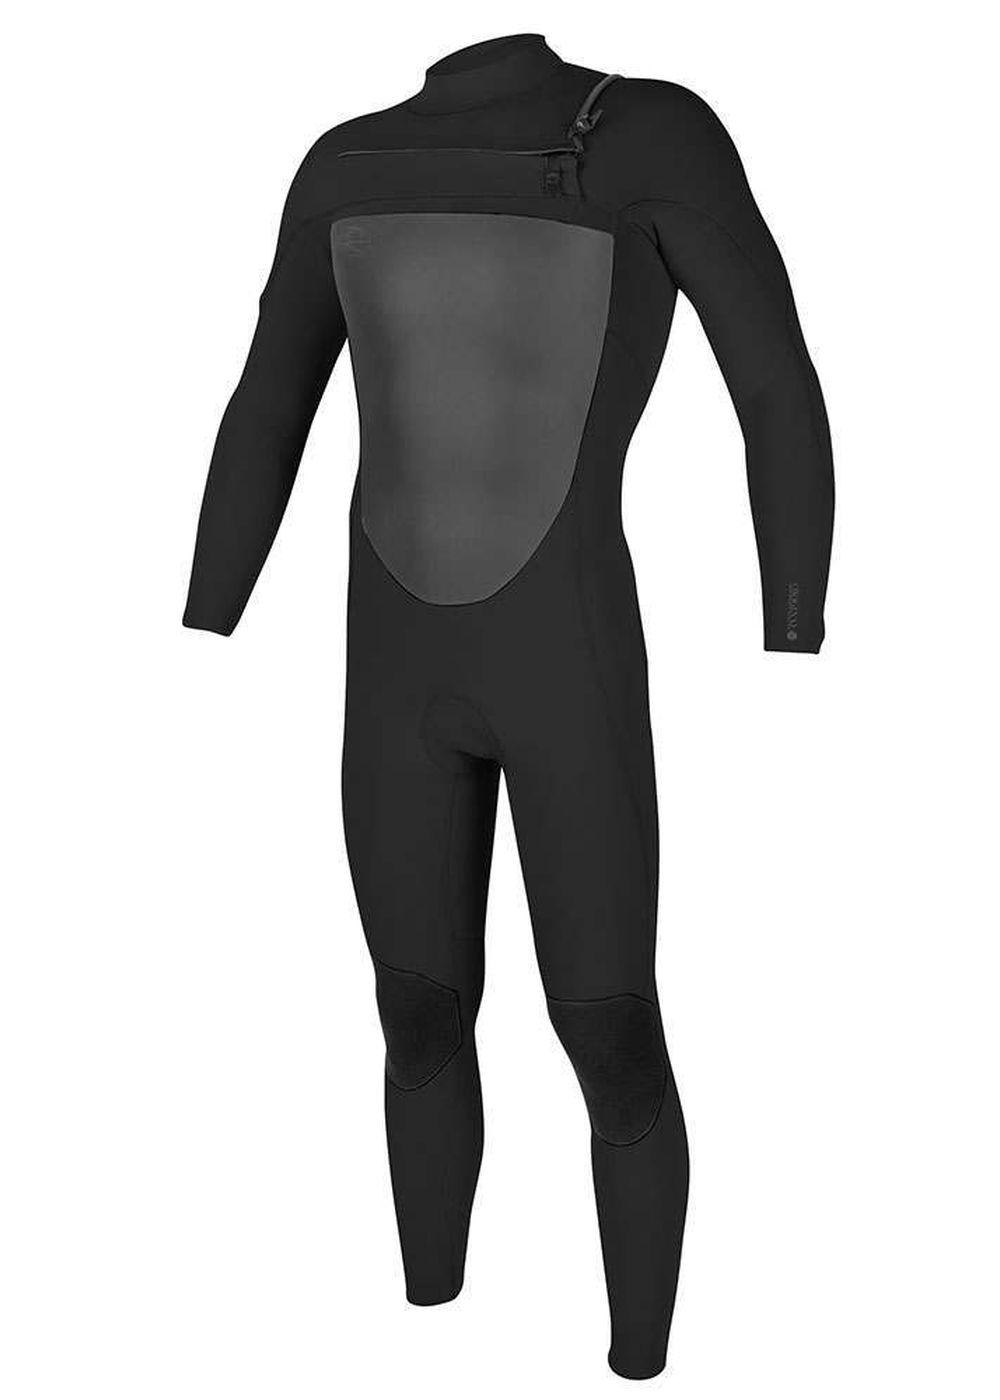 Oneill Original Fz 4/3 Wetsuit 2018 Black Picture